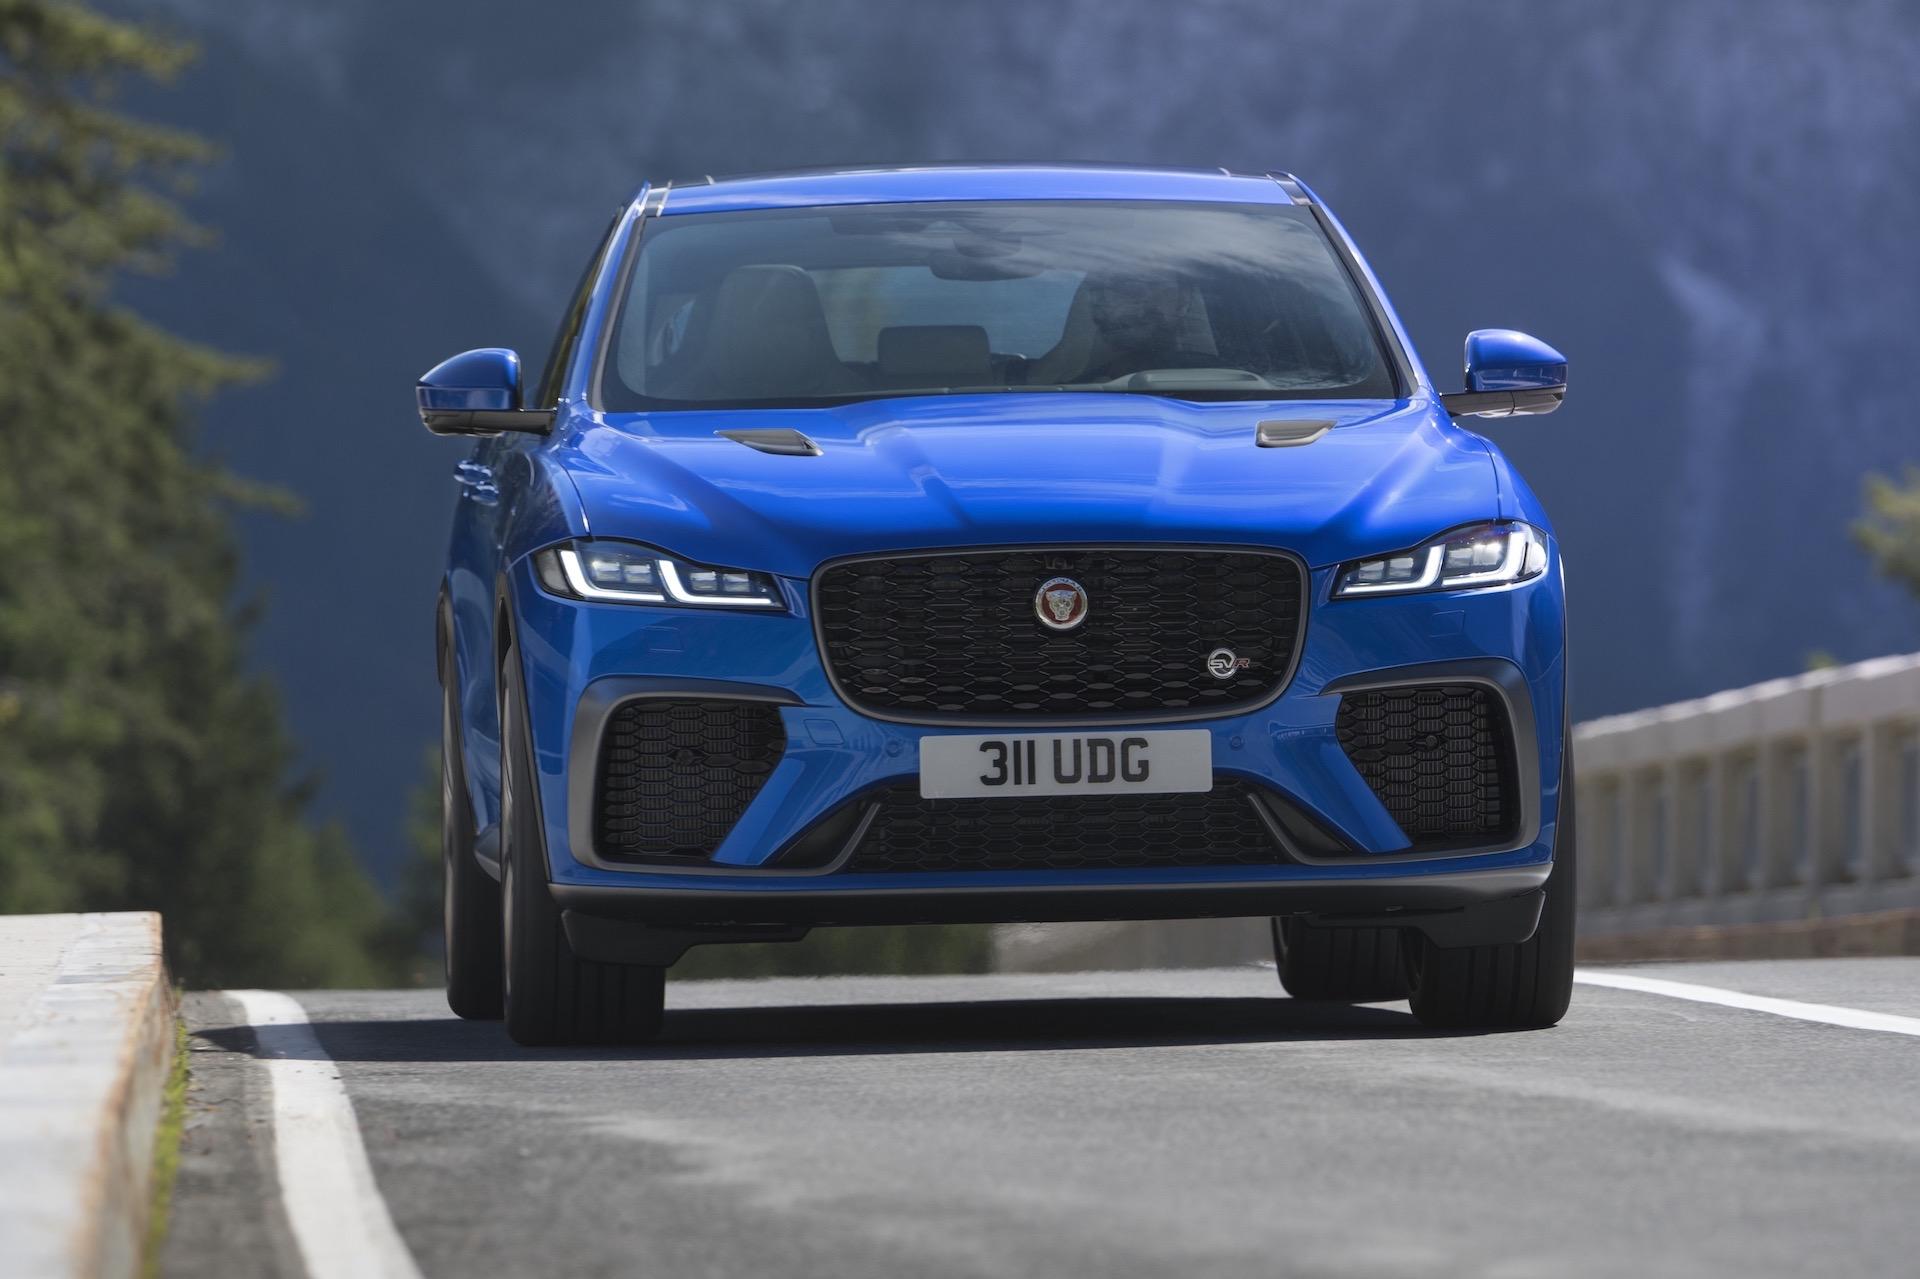 2021 jaguar f-pace svr update announced, arrives in april